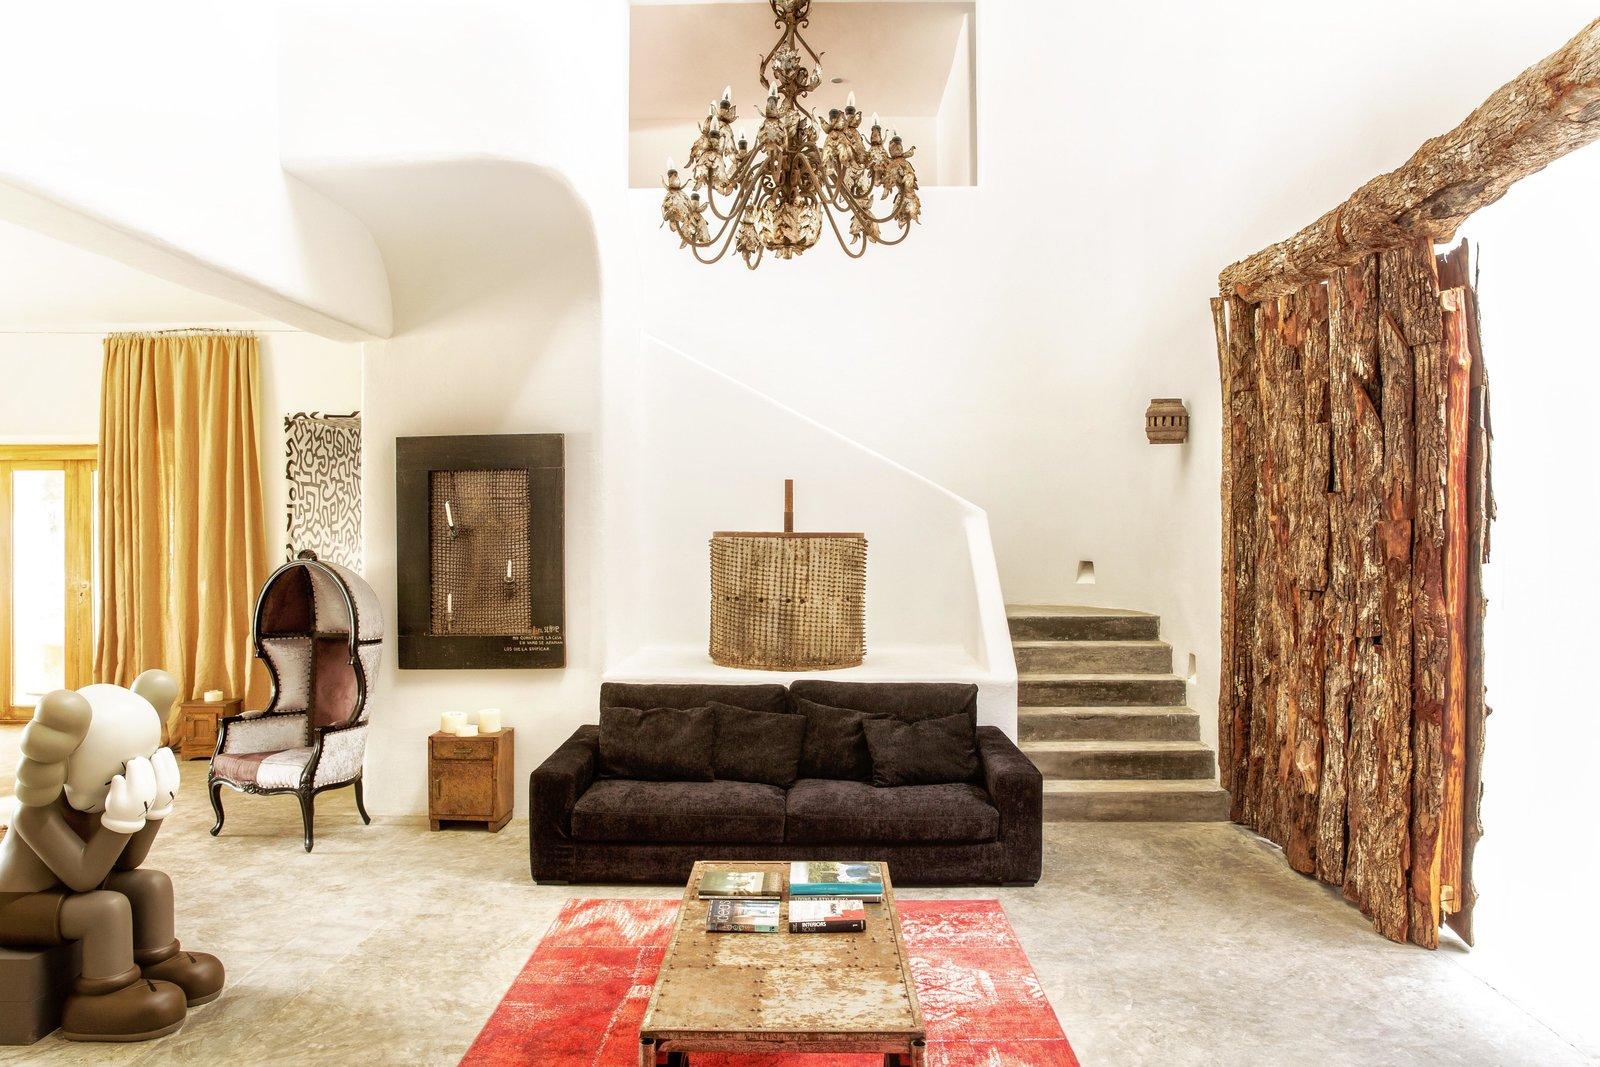 Living Room, Rug Floor, End Tables, Sofa, Pendant Lighting, Coffee Tables, Concrete Floor, and Chair  Casa Malca